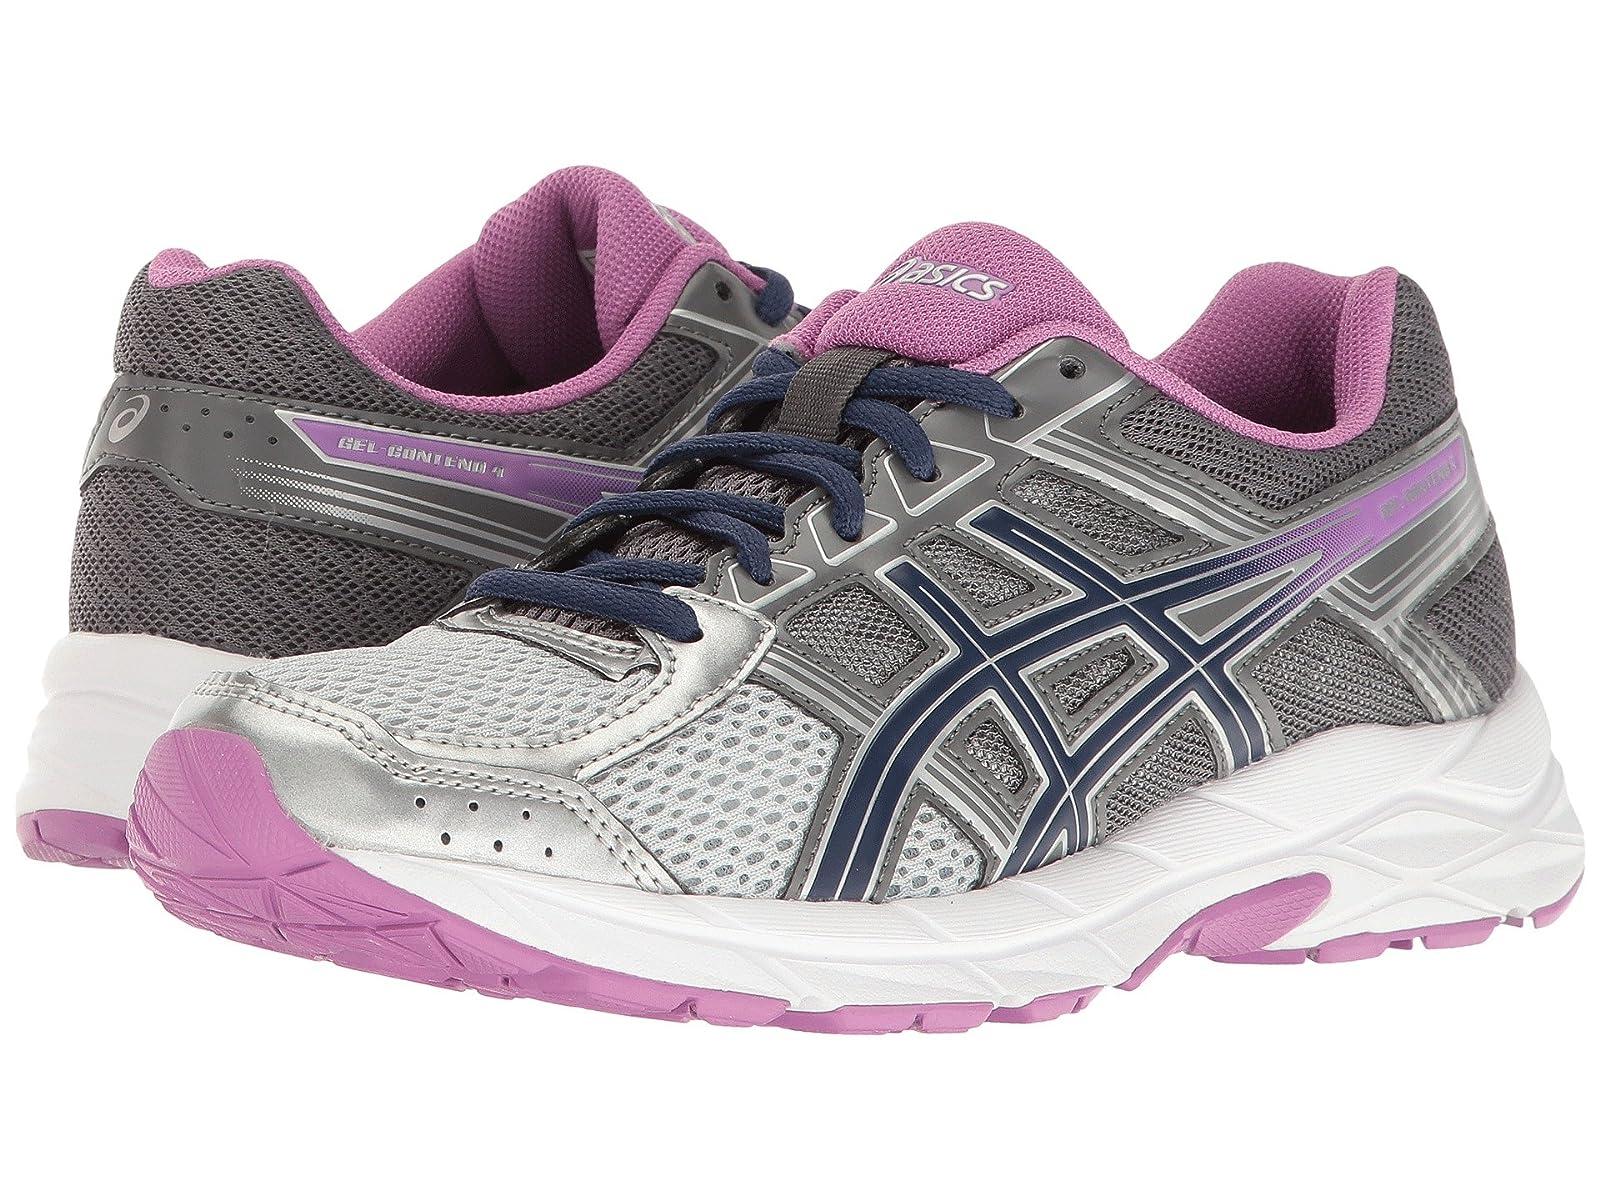 ASICS GEL-Contend 4Atmospheric grades have affordable shoes